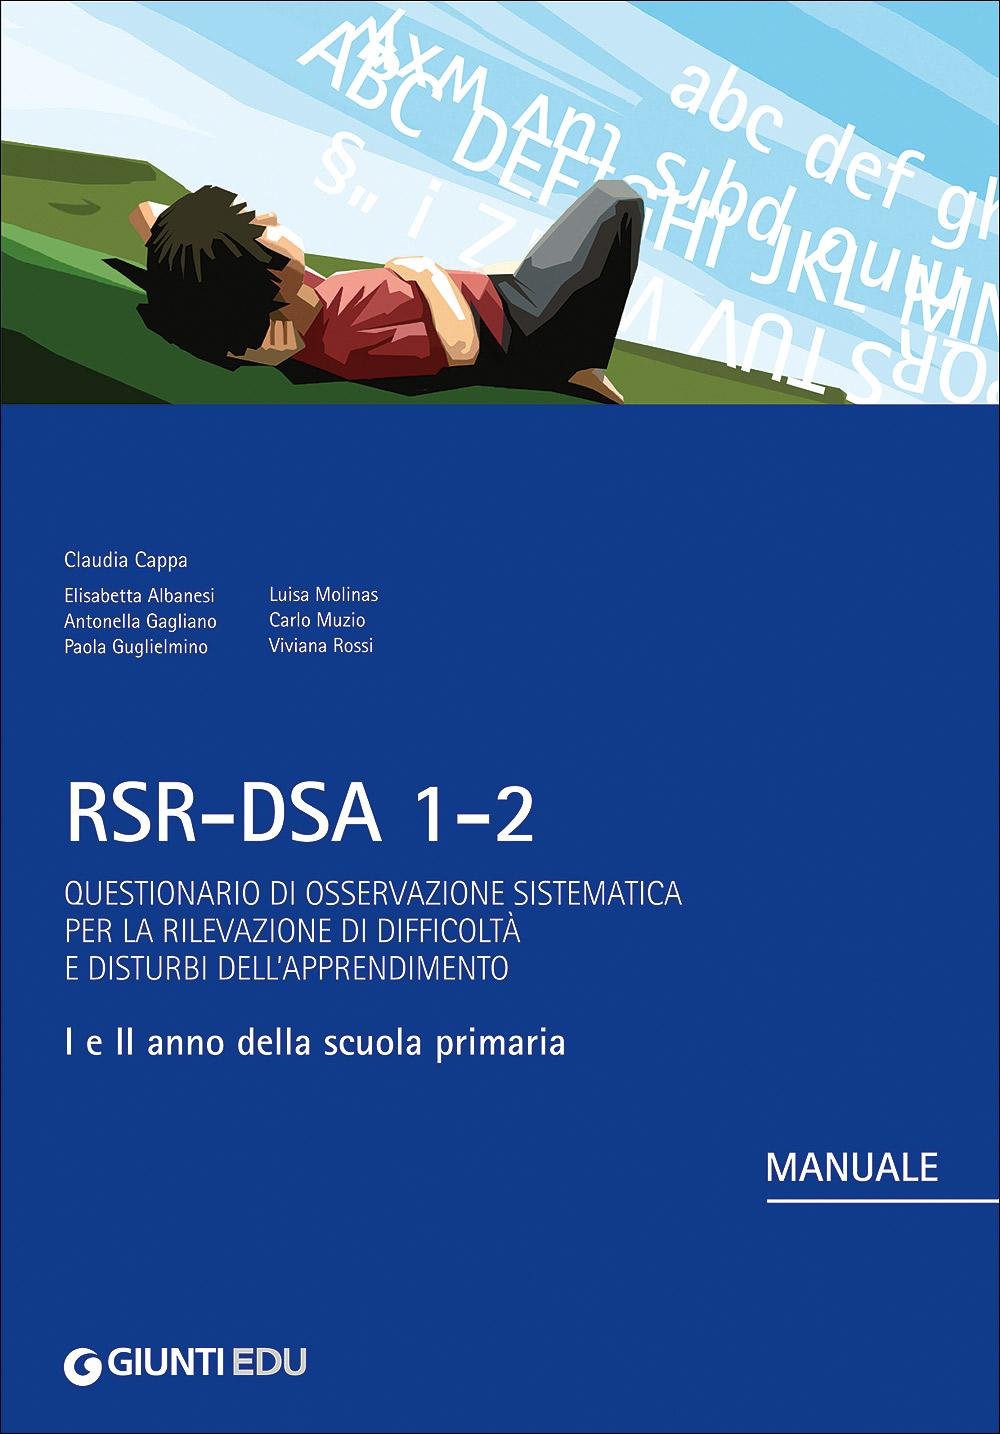 Kit RSR-DSA 1-2